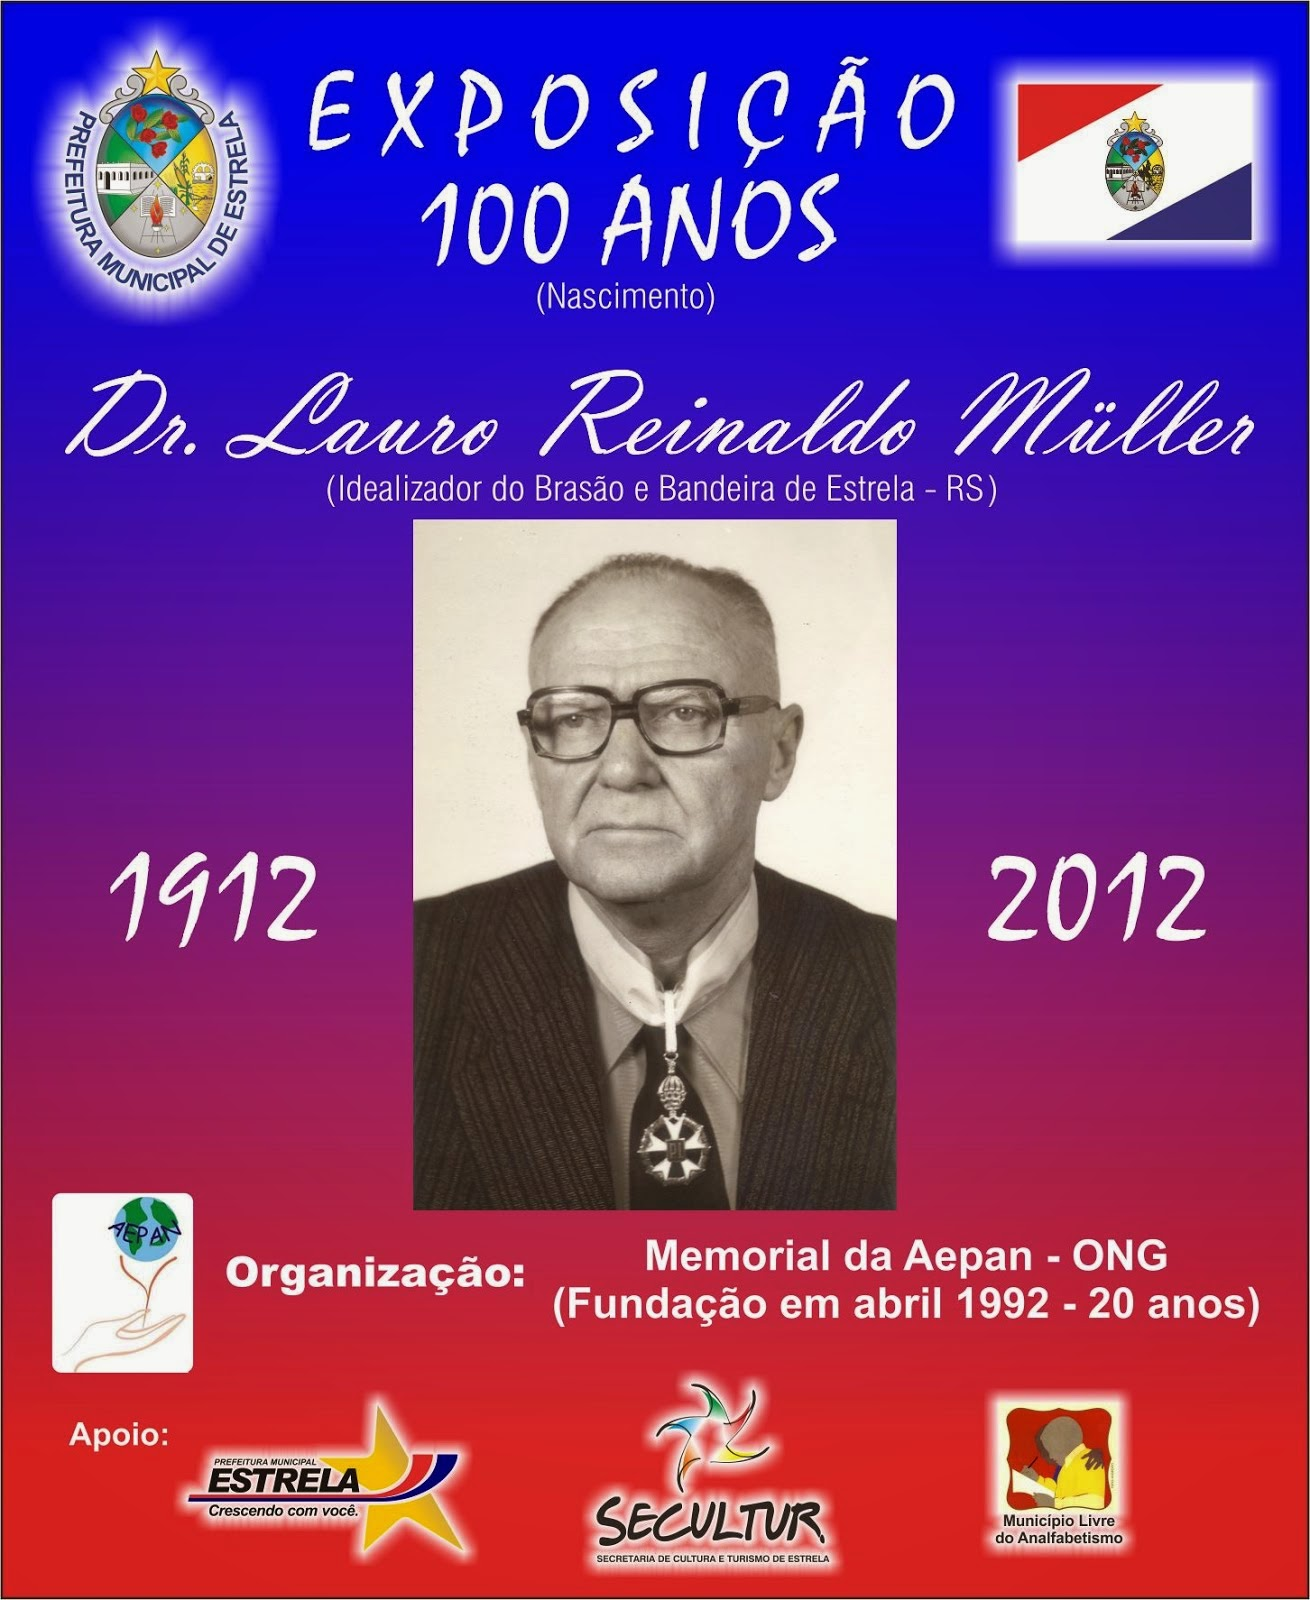 Dr. Lauro Reinaldo Müller